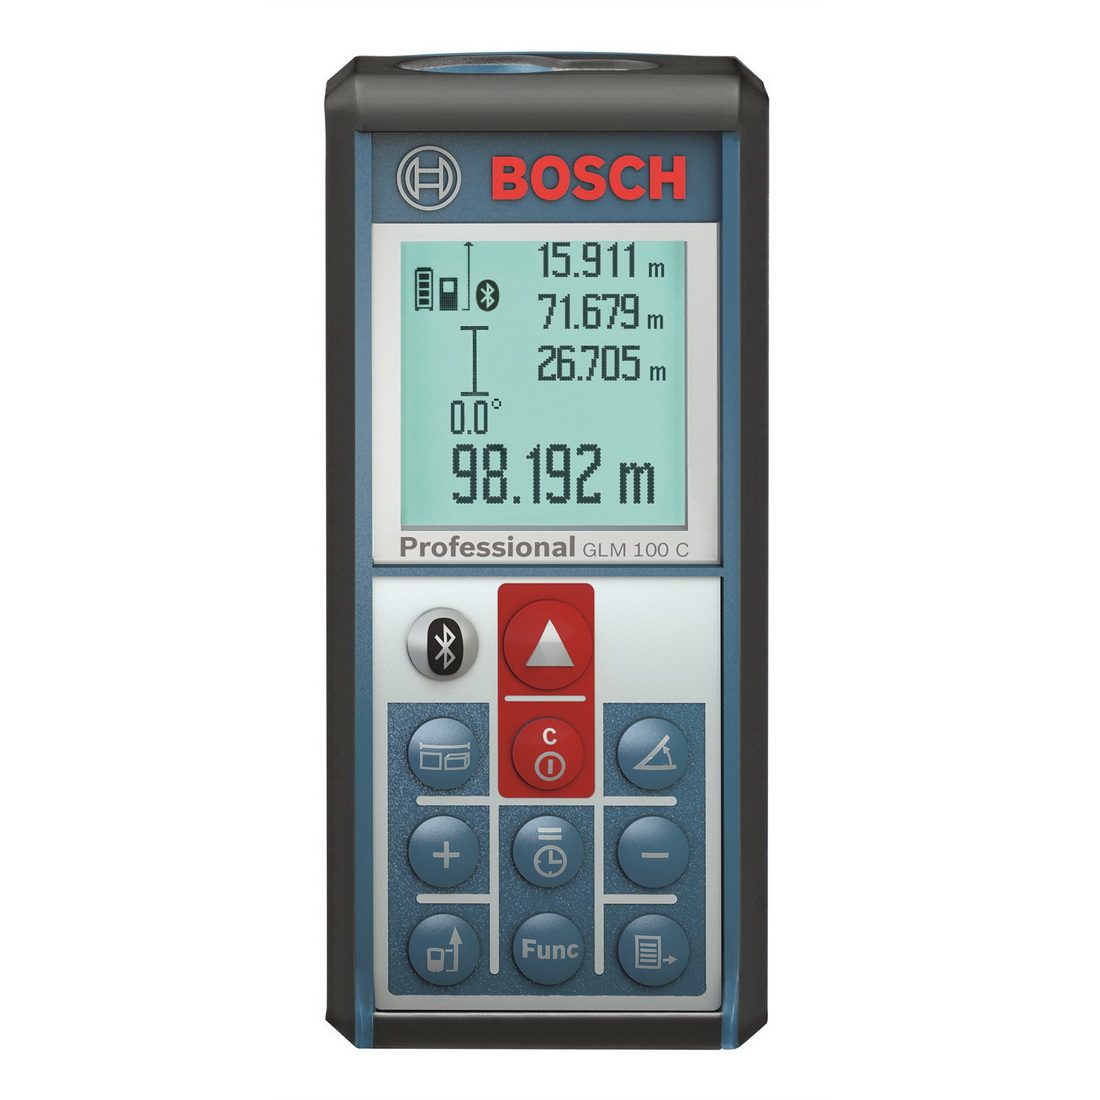 GLM 100 C Professional Laser Measure 0.05-100m 601072740